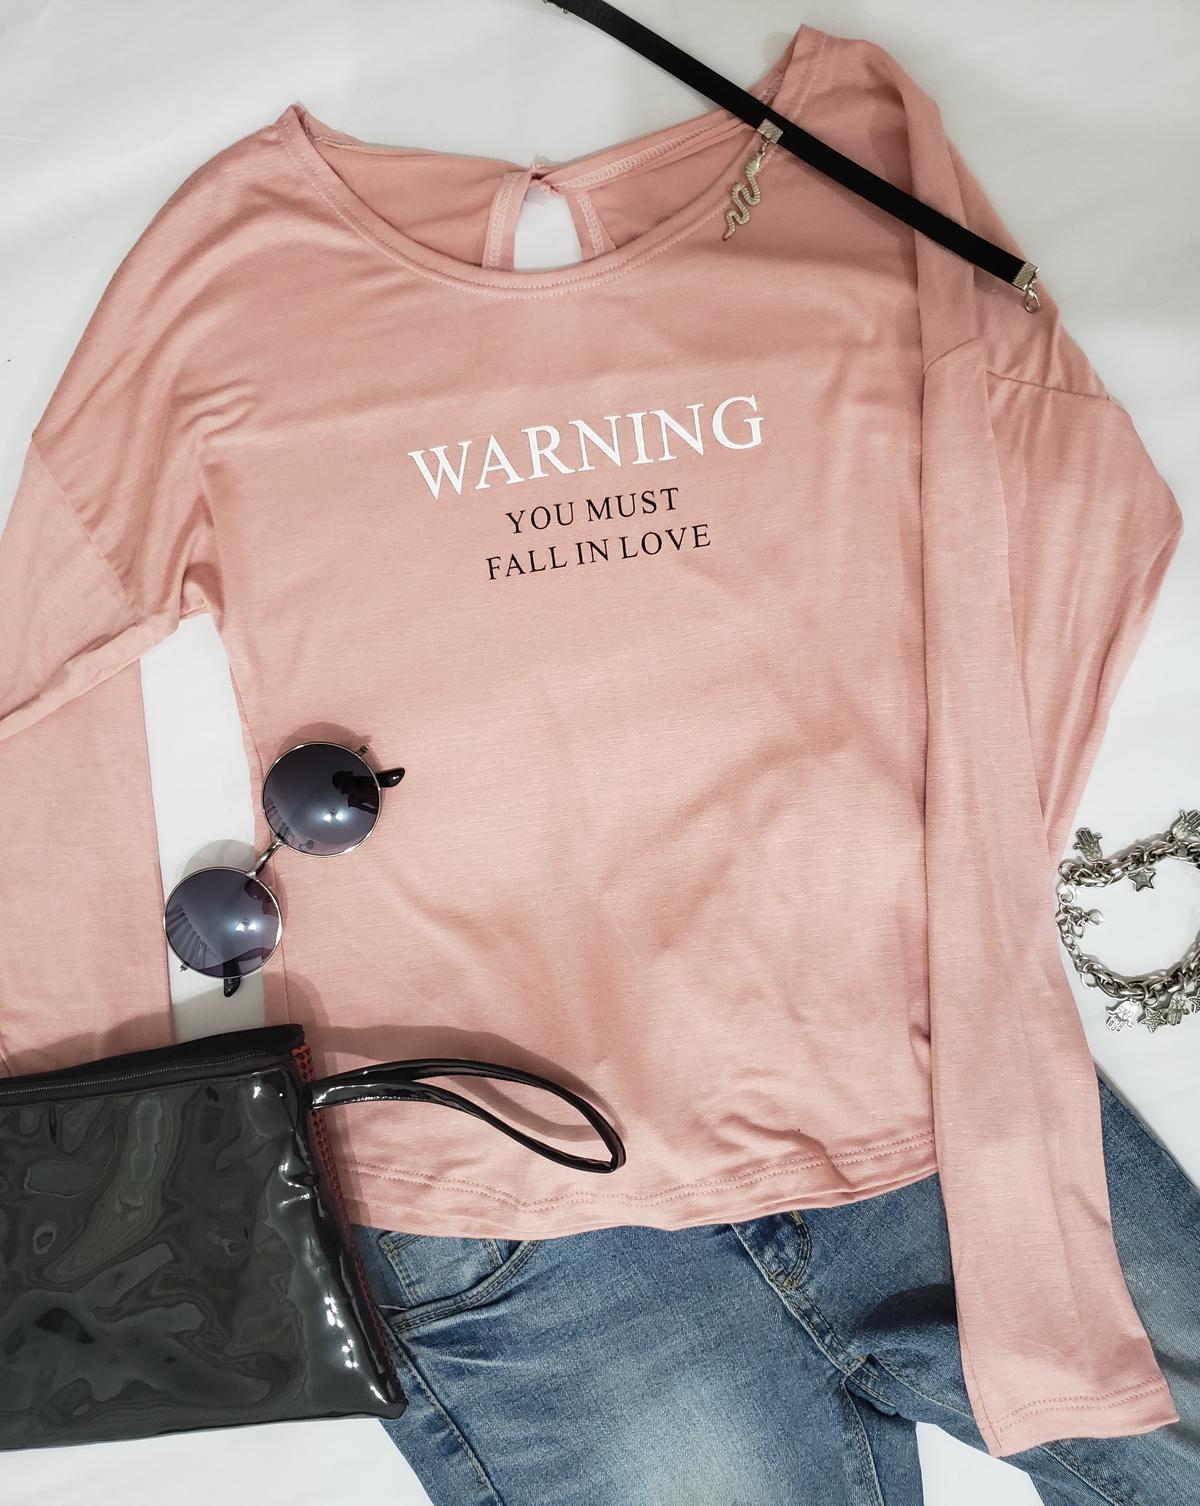 Imagen producto camiseta-detalle atras 6